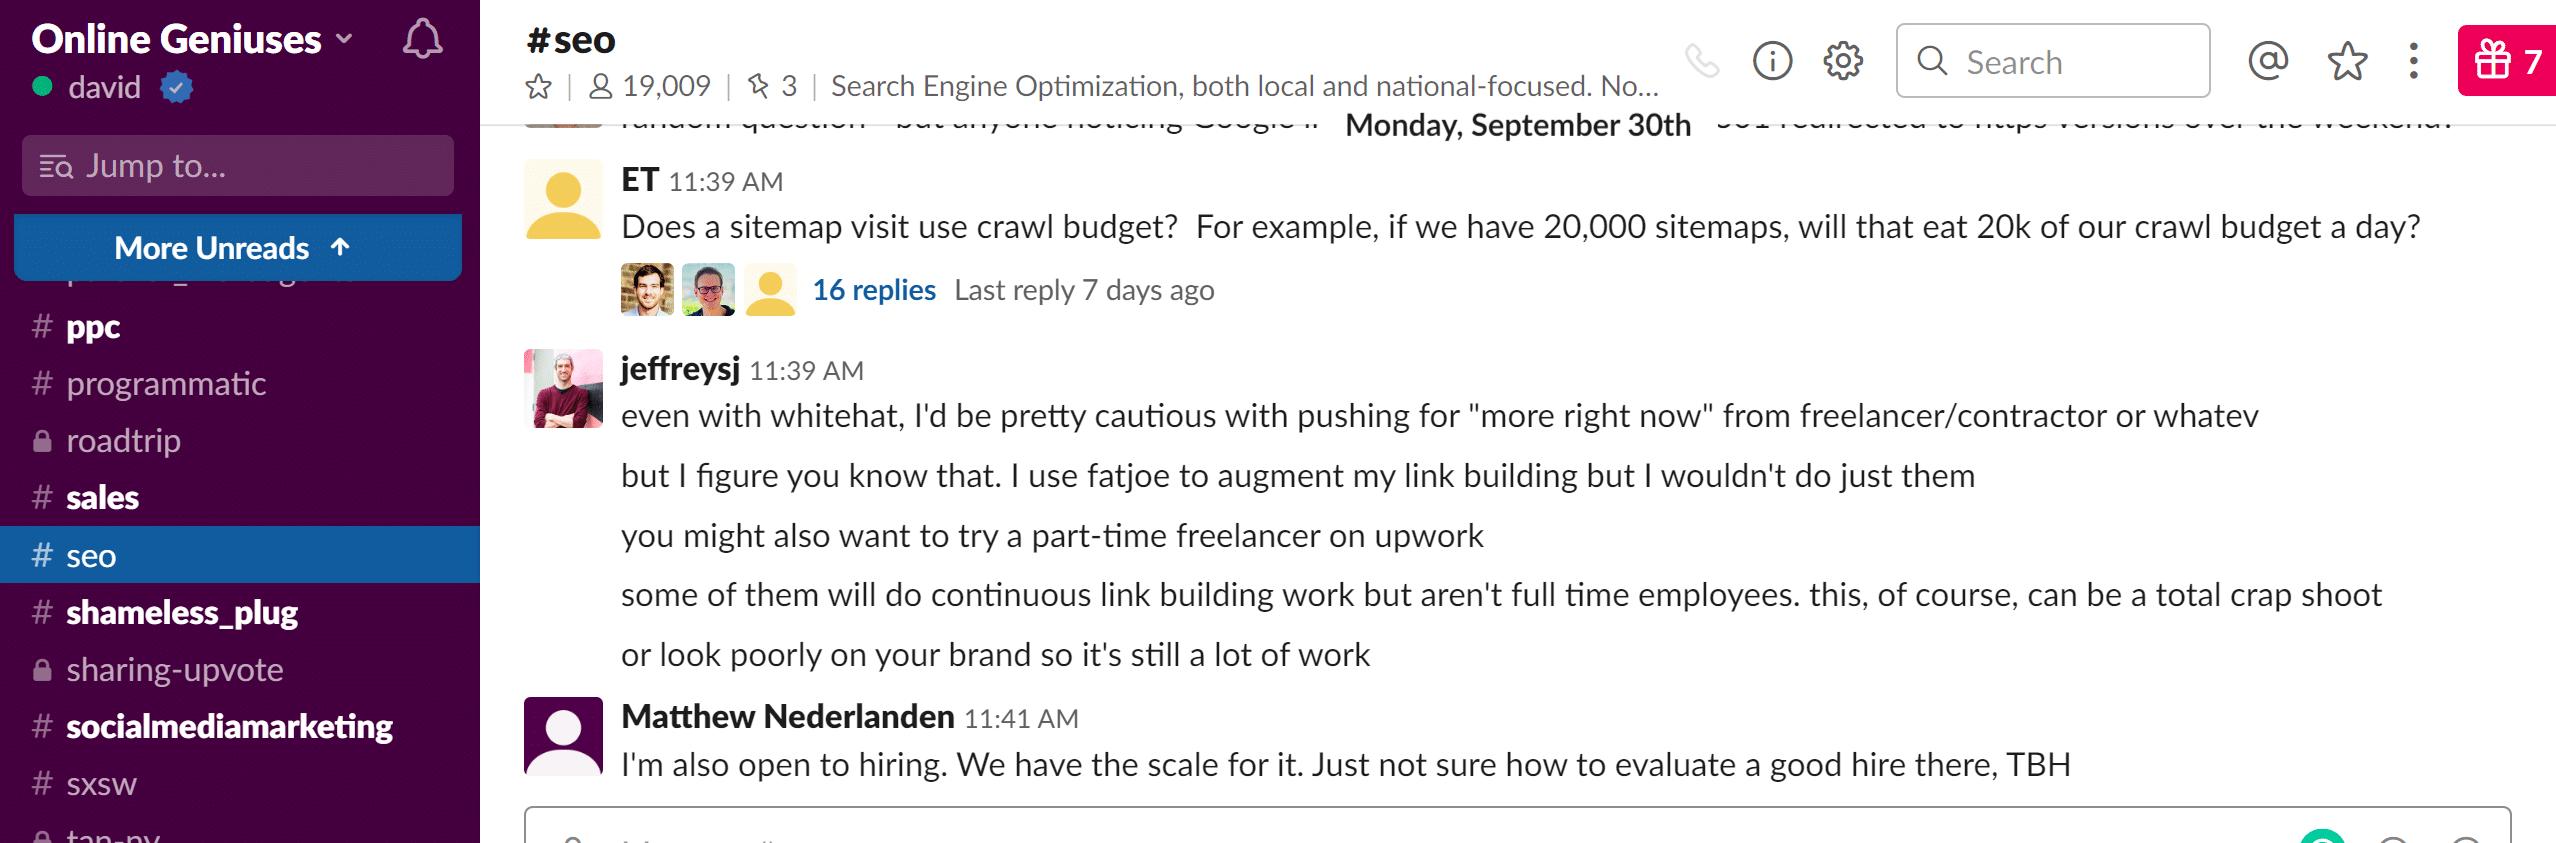 Online Geniuses Slack Community